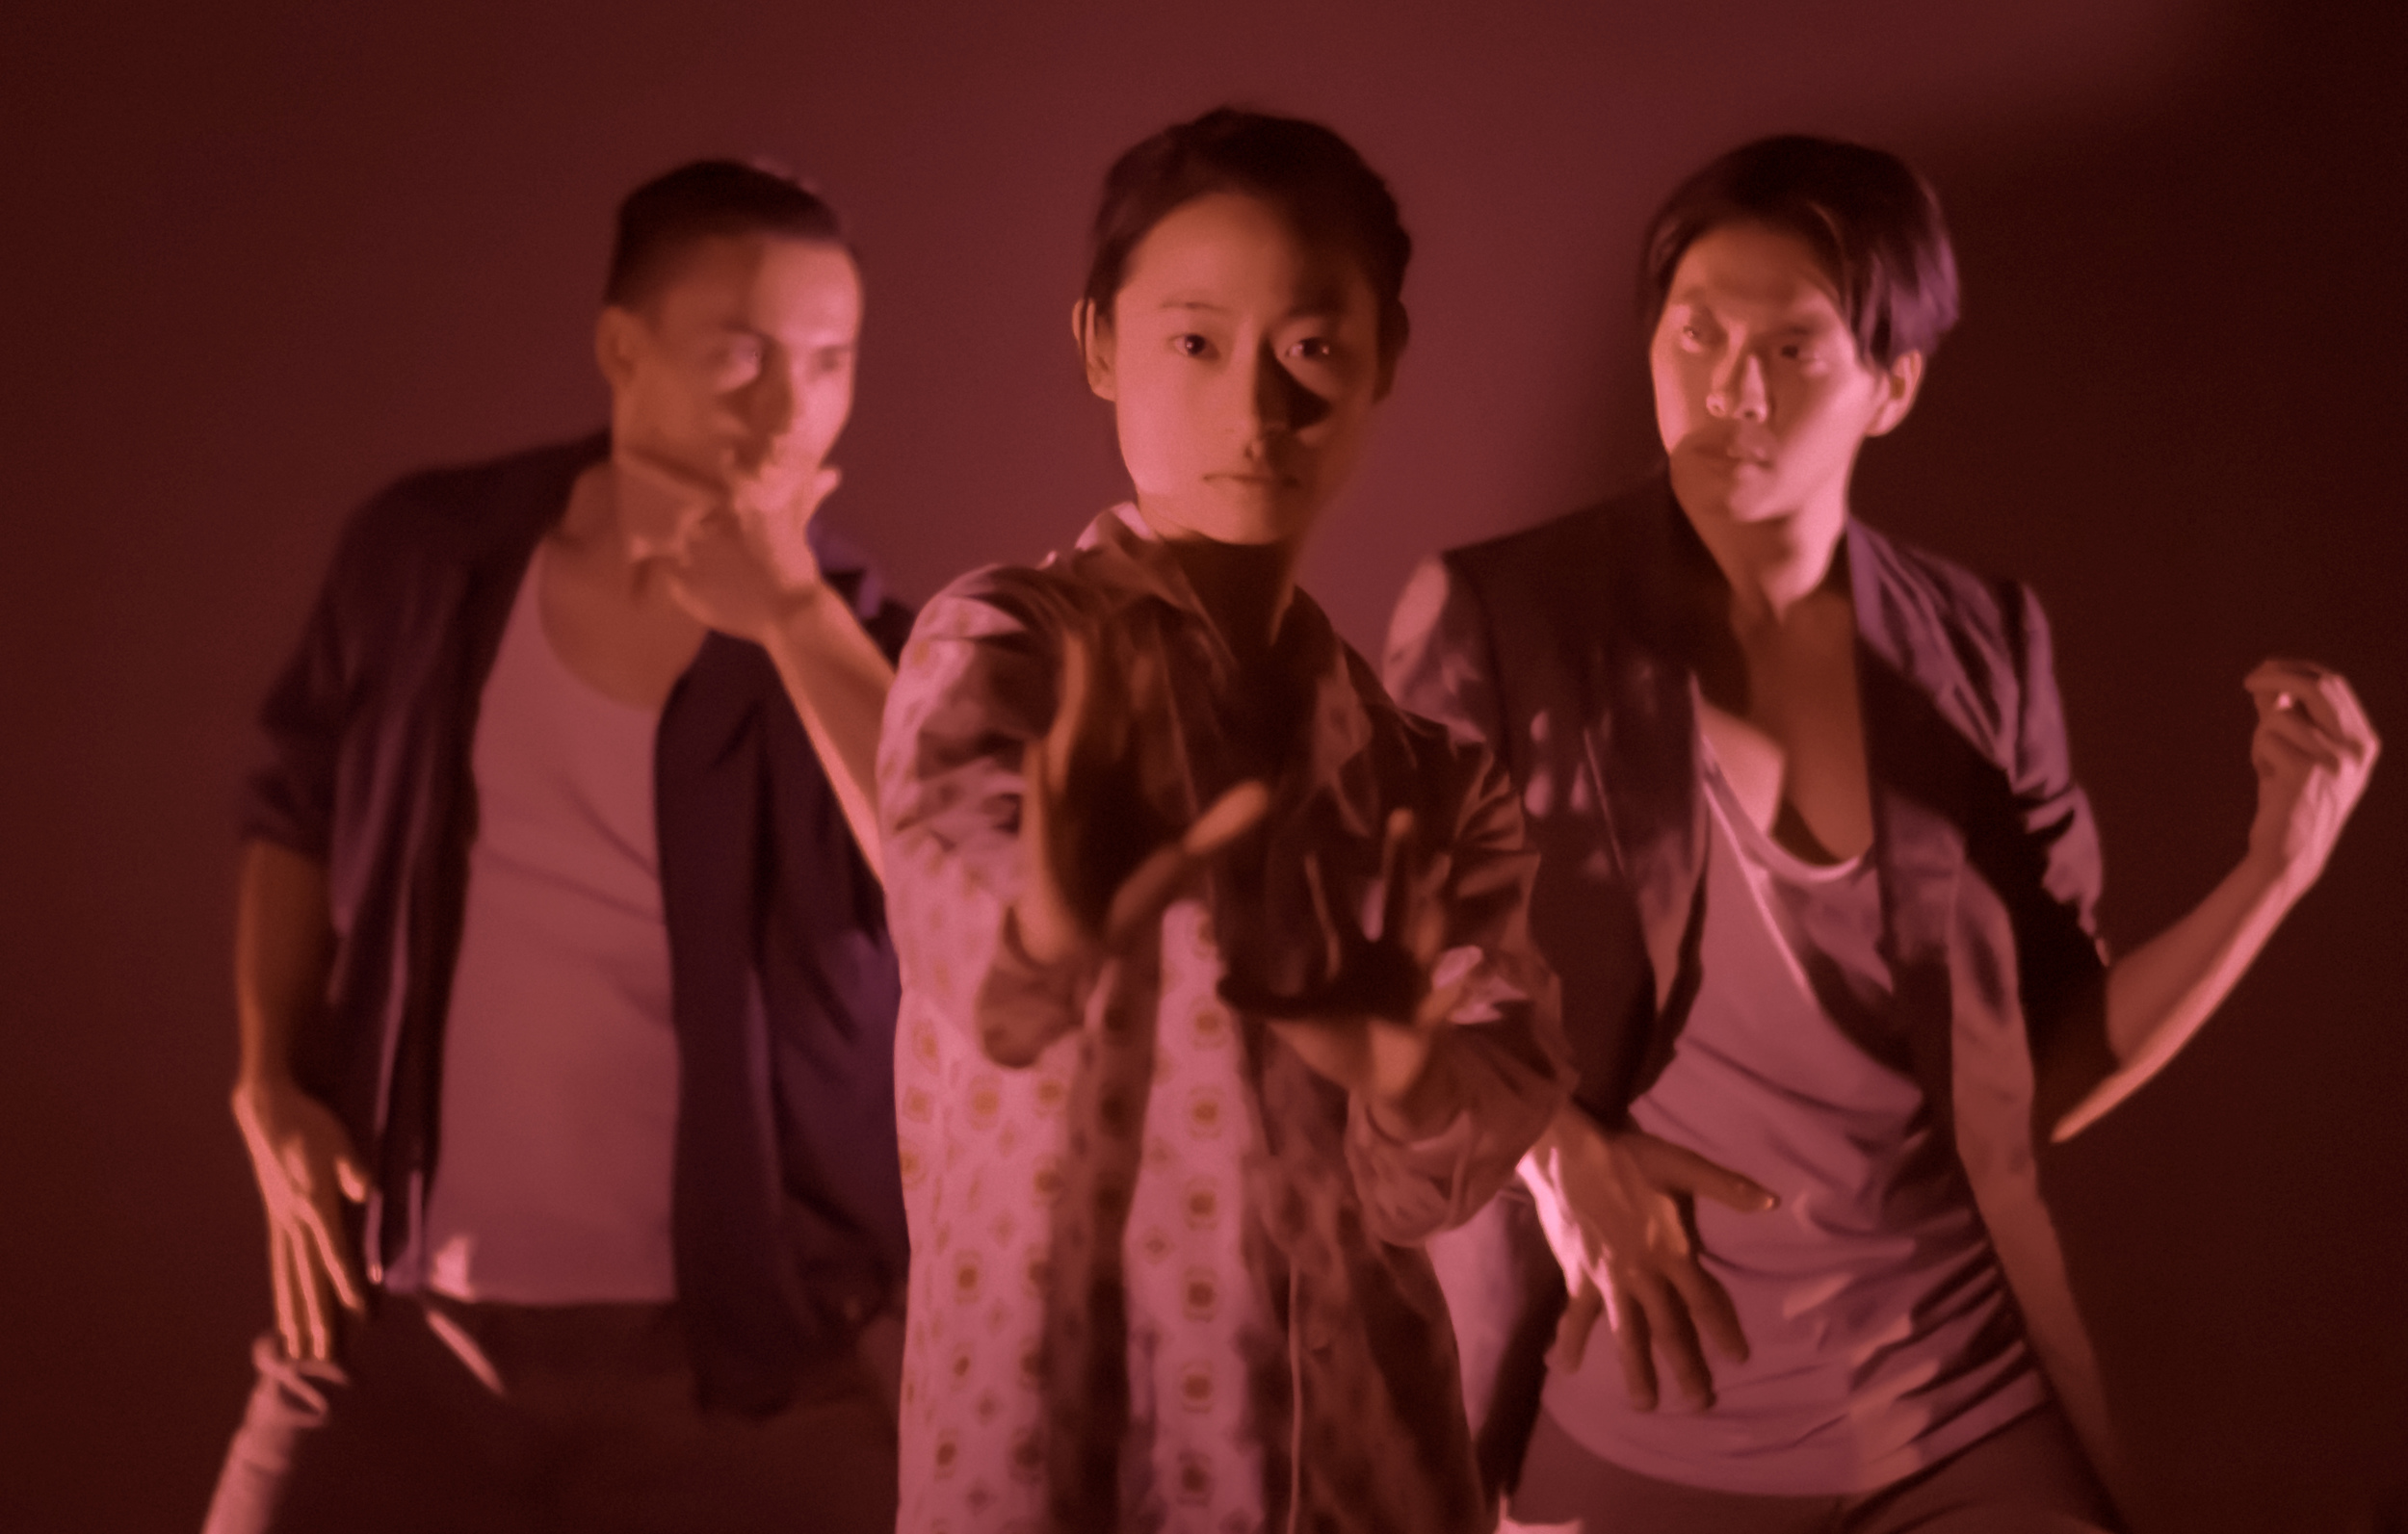 HKX+-+NINEEIGHT+Promotional+Photo+5+[Landscape].jpg